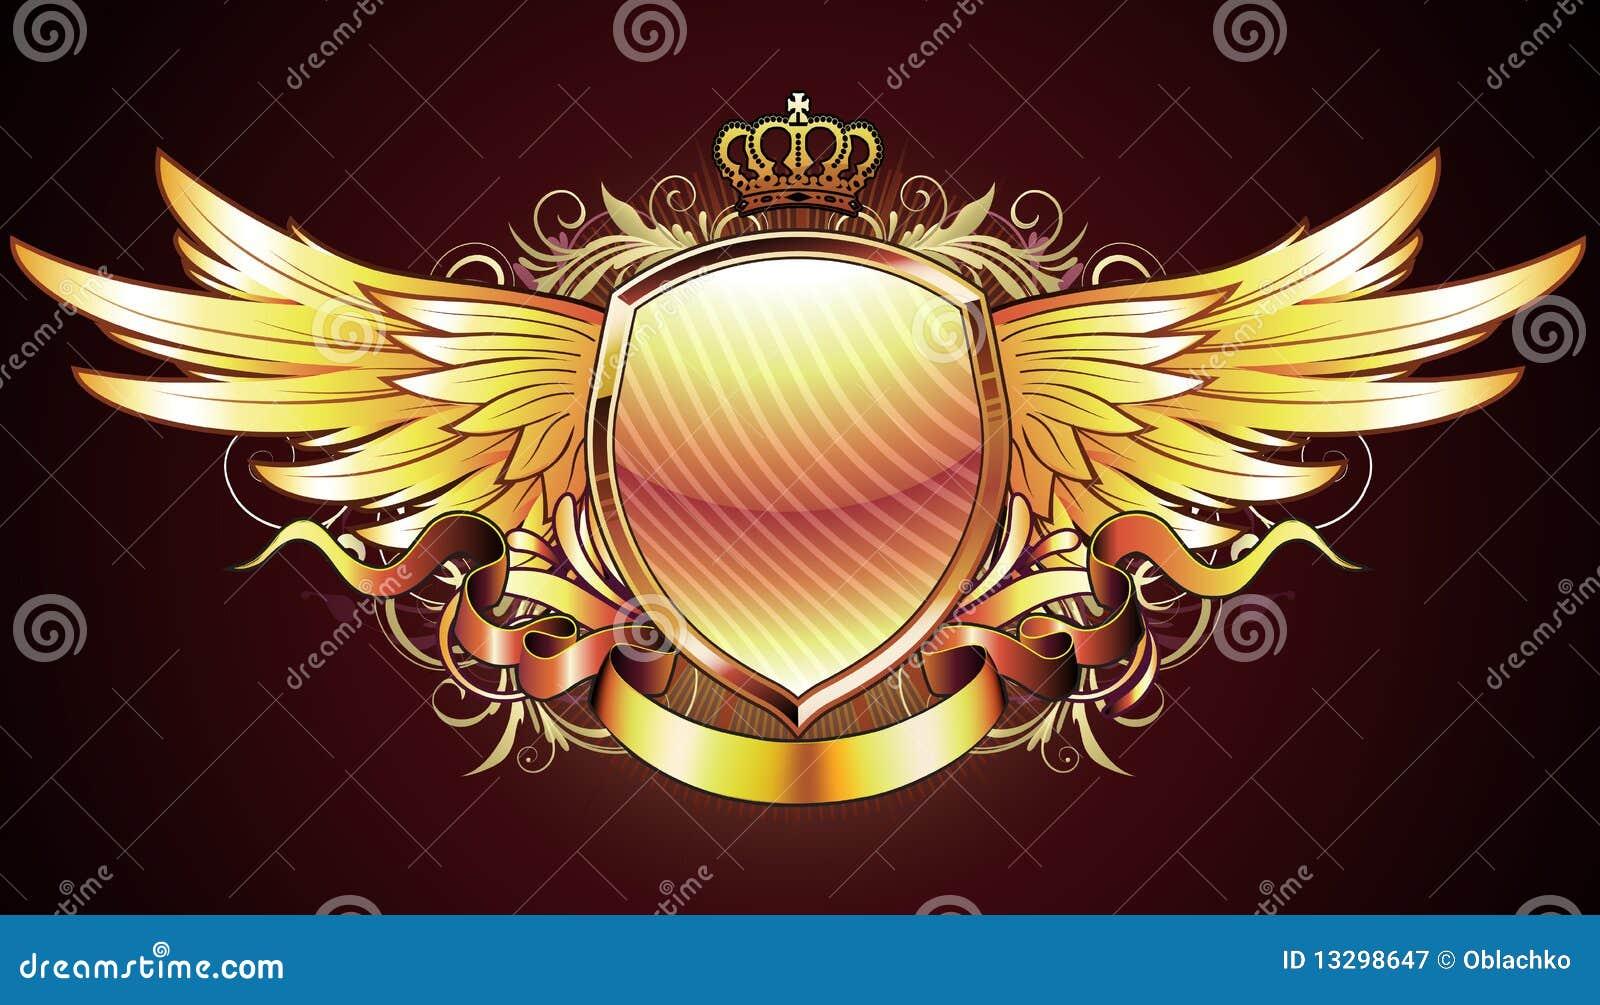 Heraldic Golden Shield Royalty Free Stock Photography - Image ...